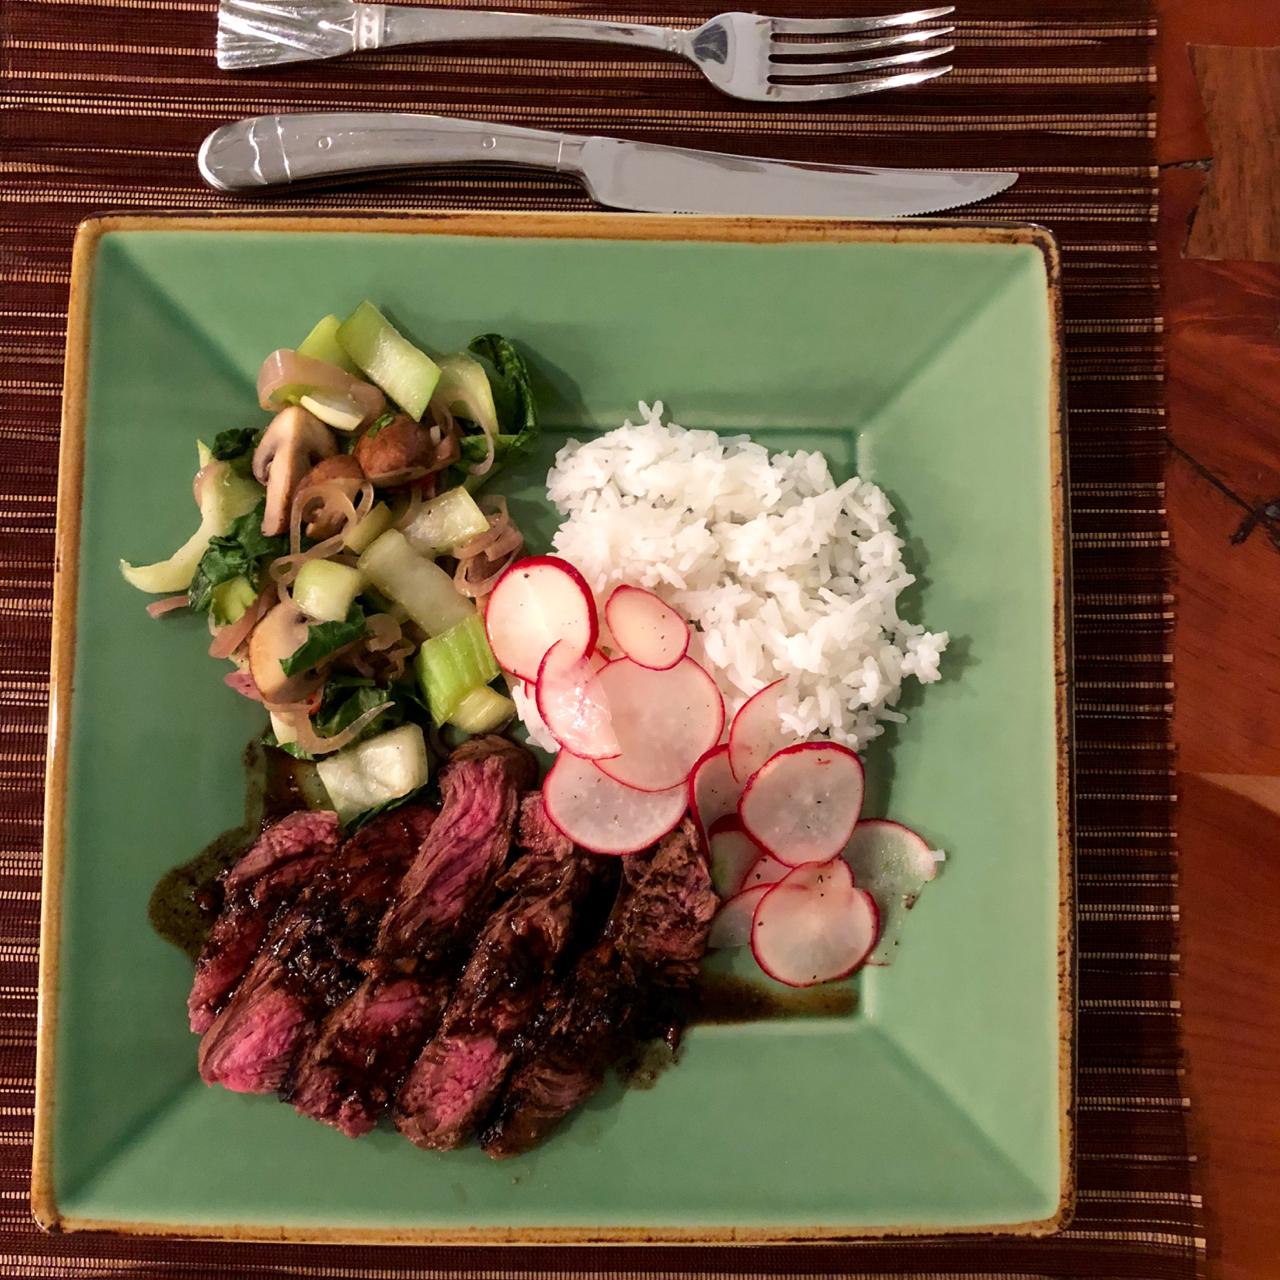 jo-torrijos-states-of-reverie-blue-apron-top-chef-strip-steak-sweet-chili-glazed-vegetables-3.jpg